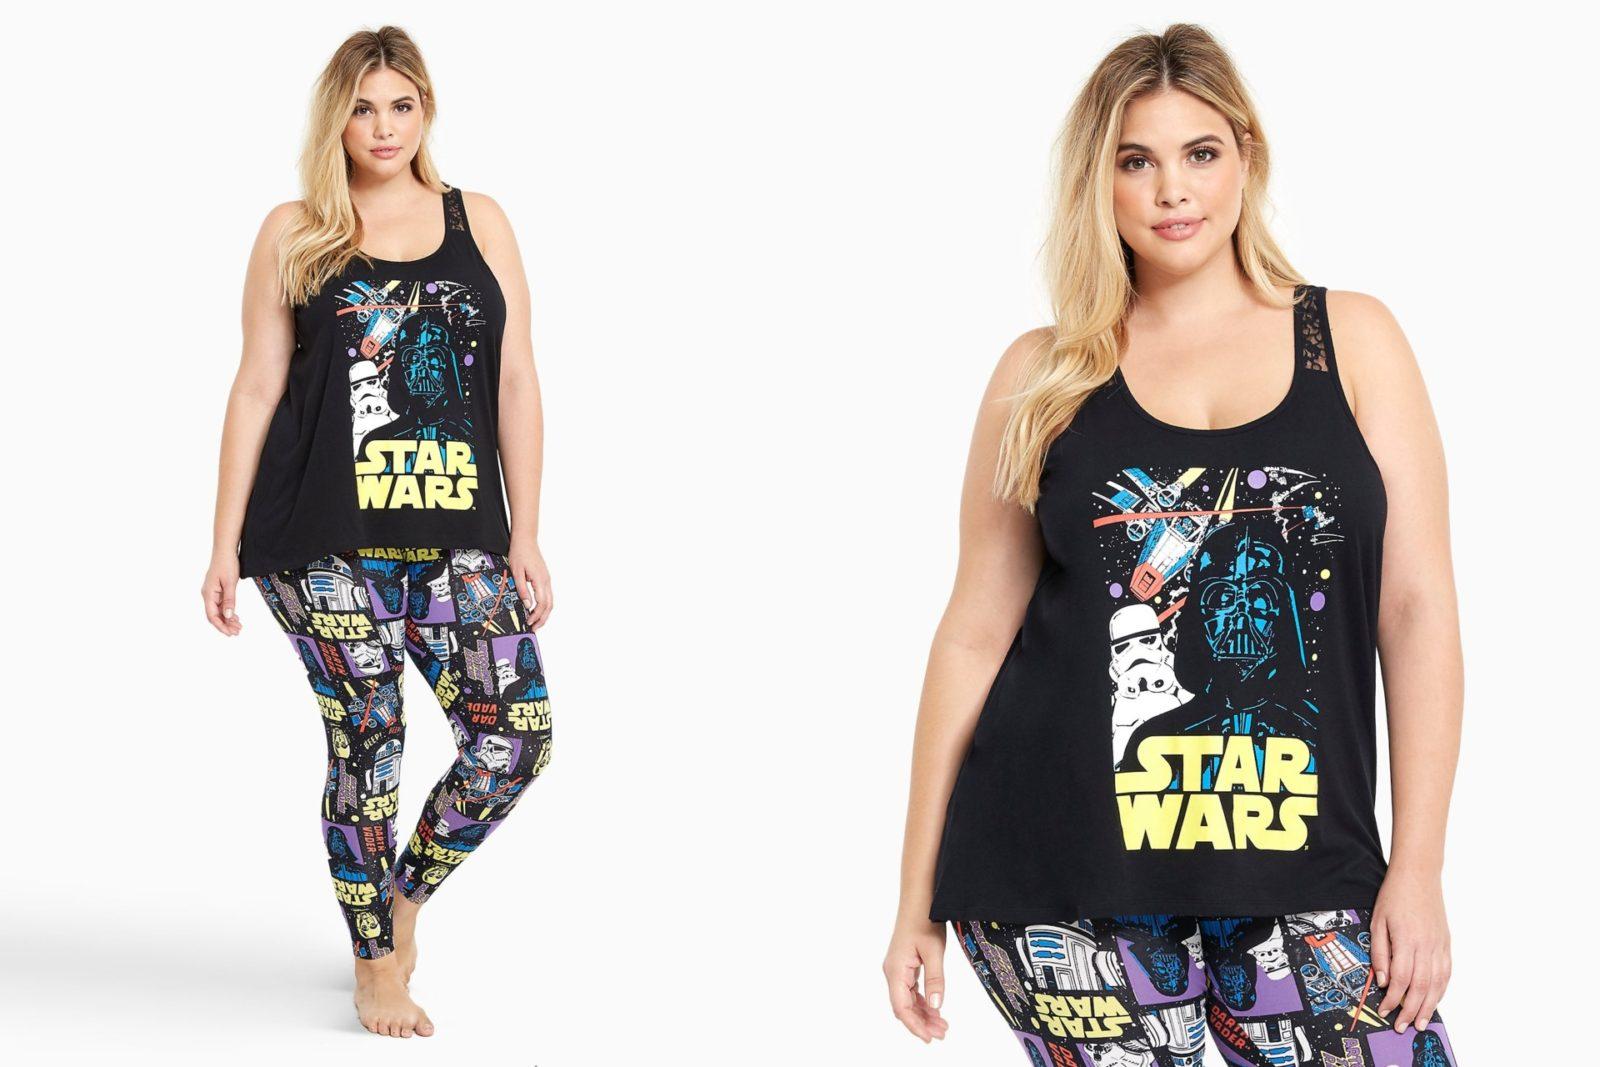 Women's Star Wars sleepwear at Torrid